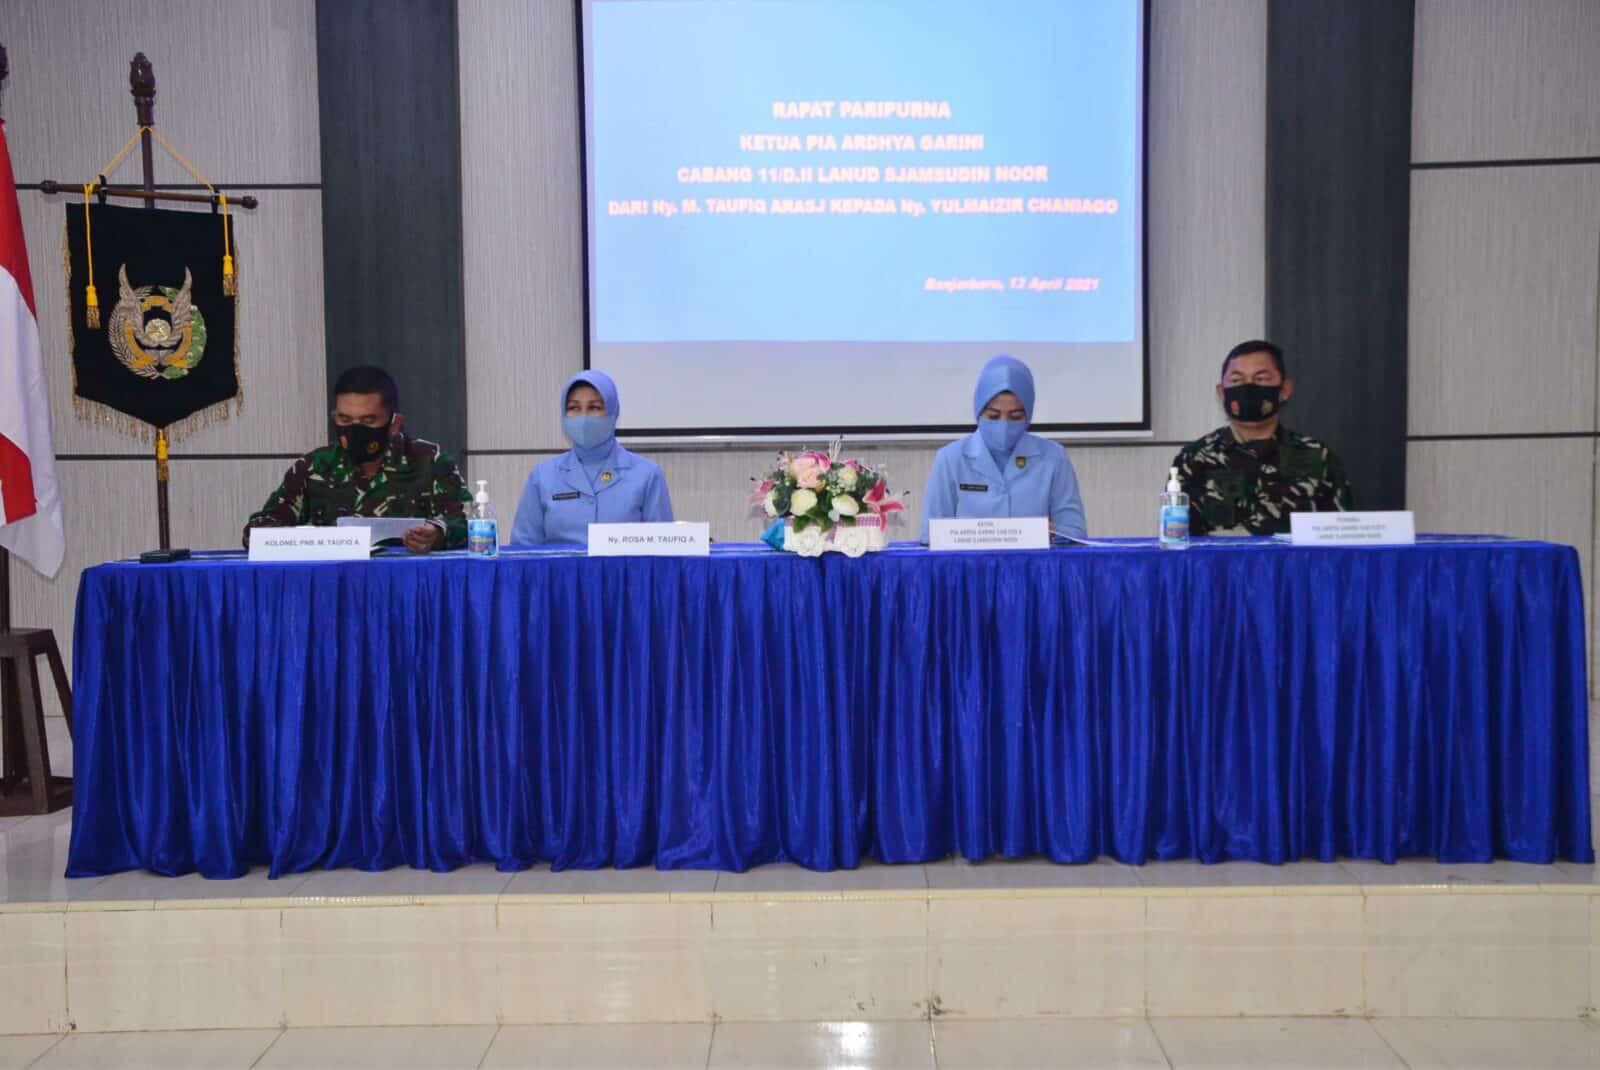 Rapat Paripurna PIA Ardhya Garini Cab.11/D.II Lanud Sjamsudin Noor